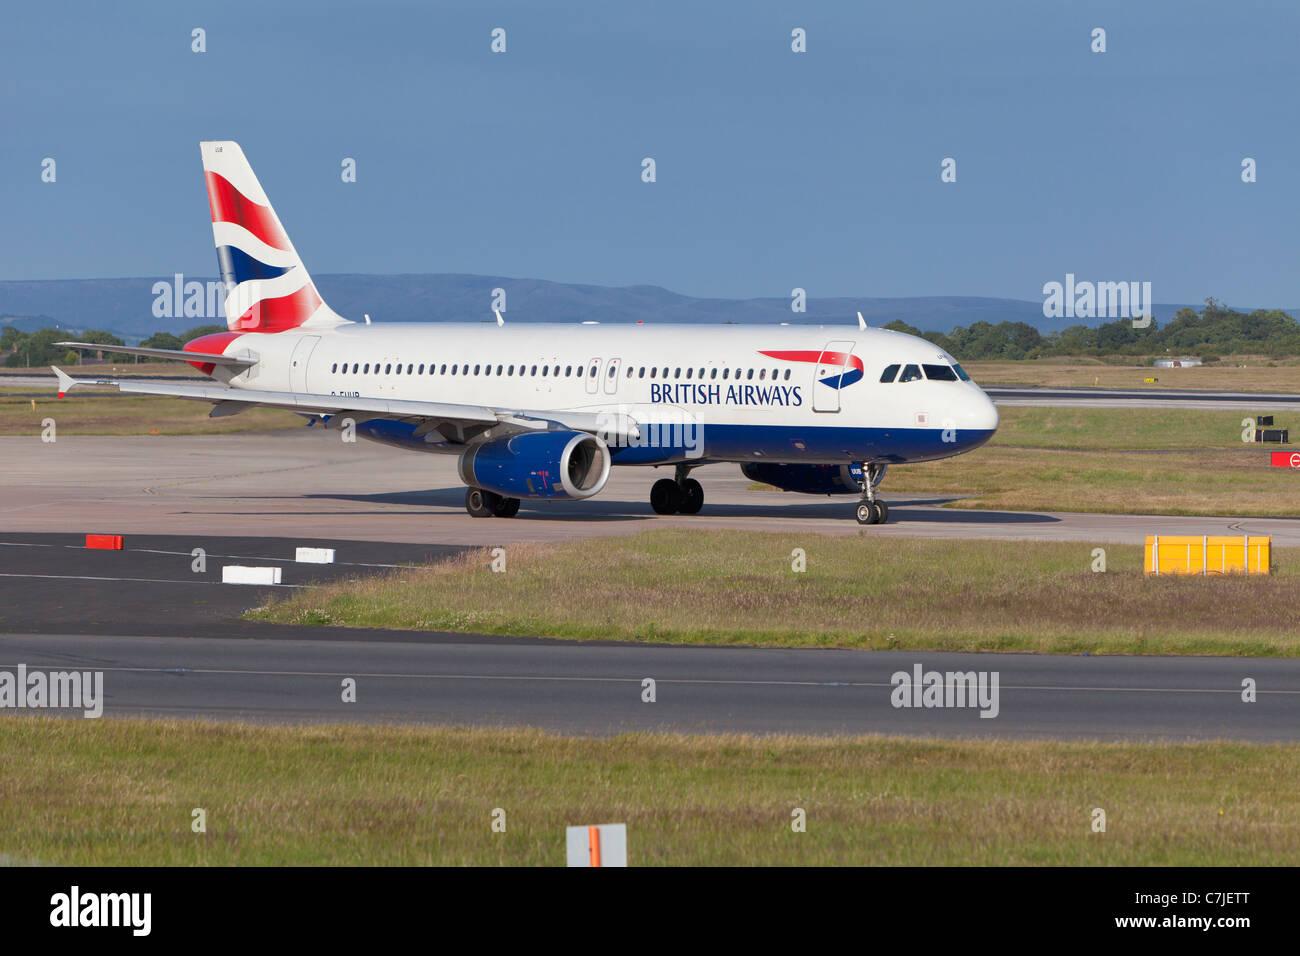 A BA aircraft, England - Stock Image